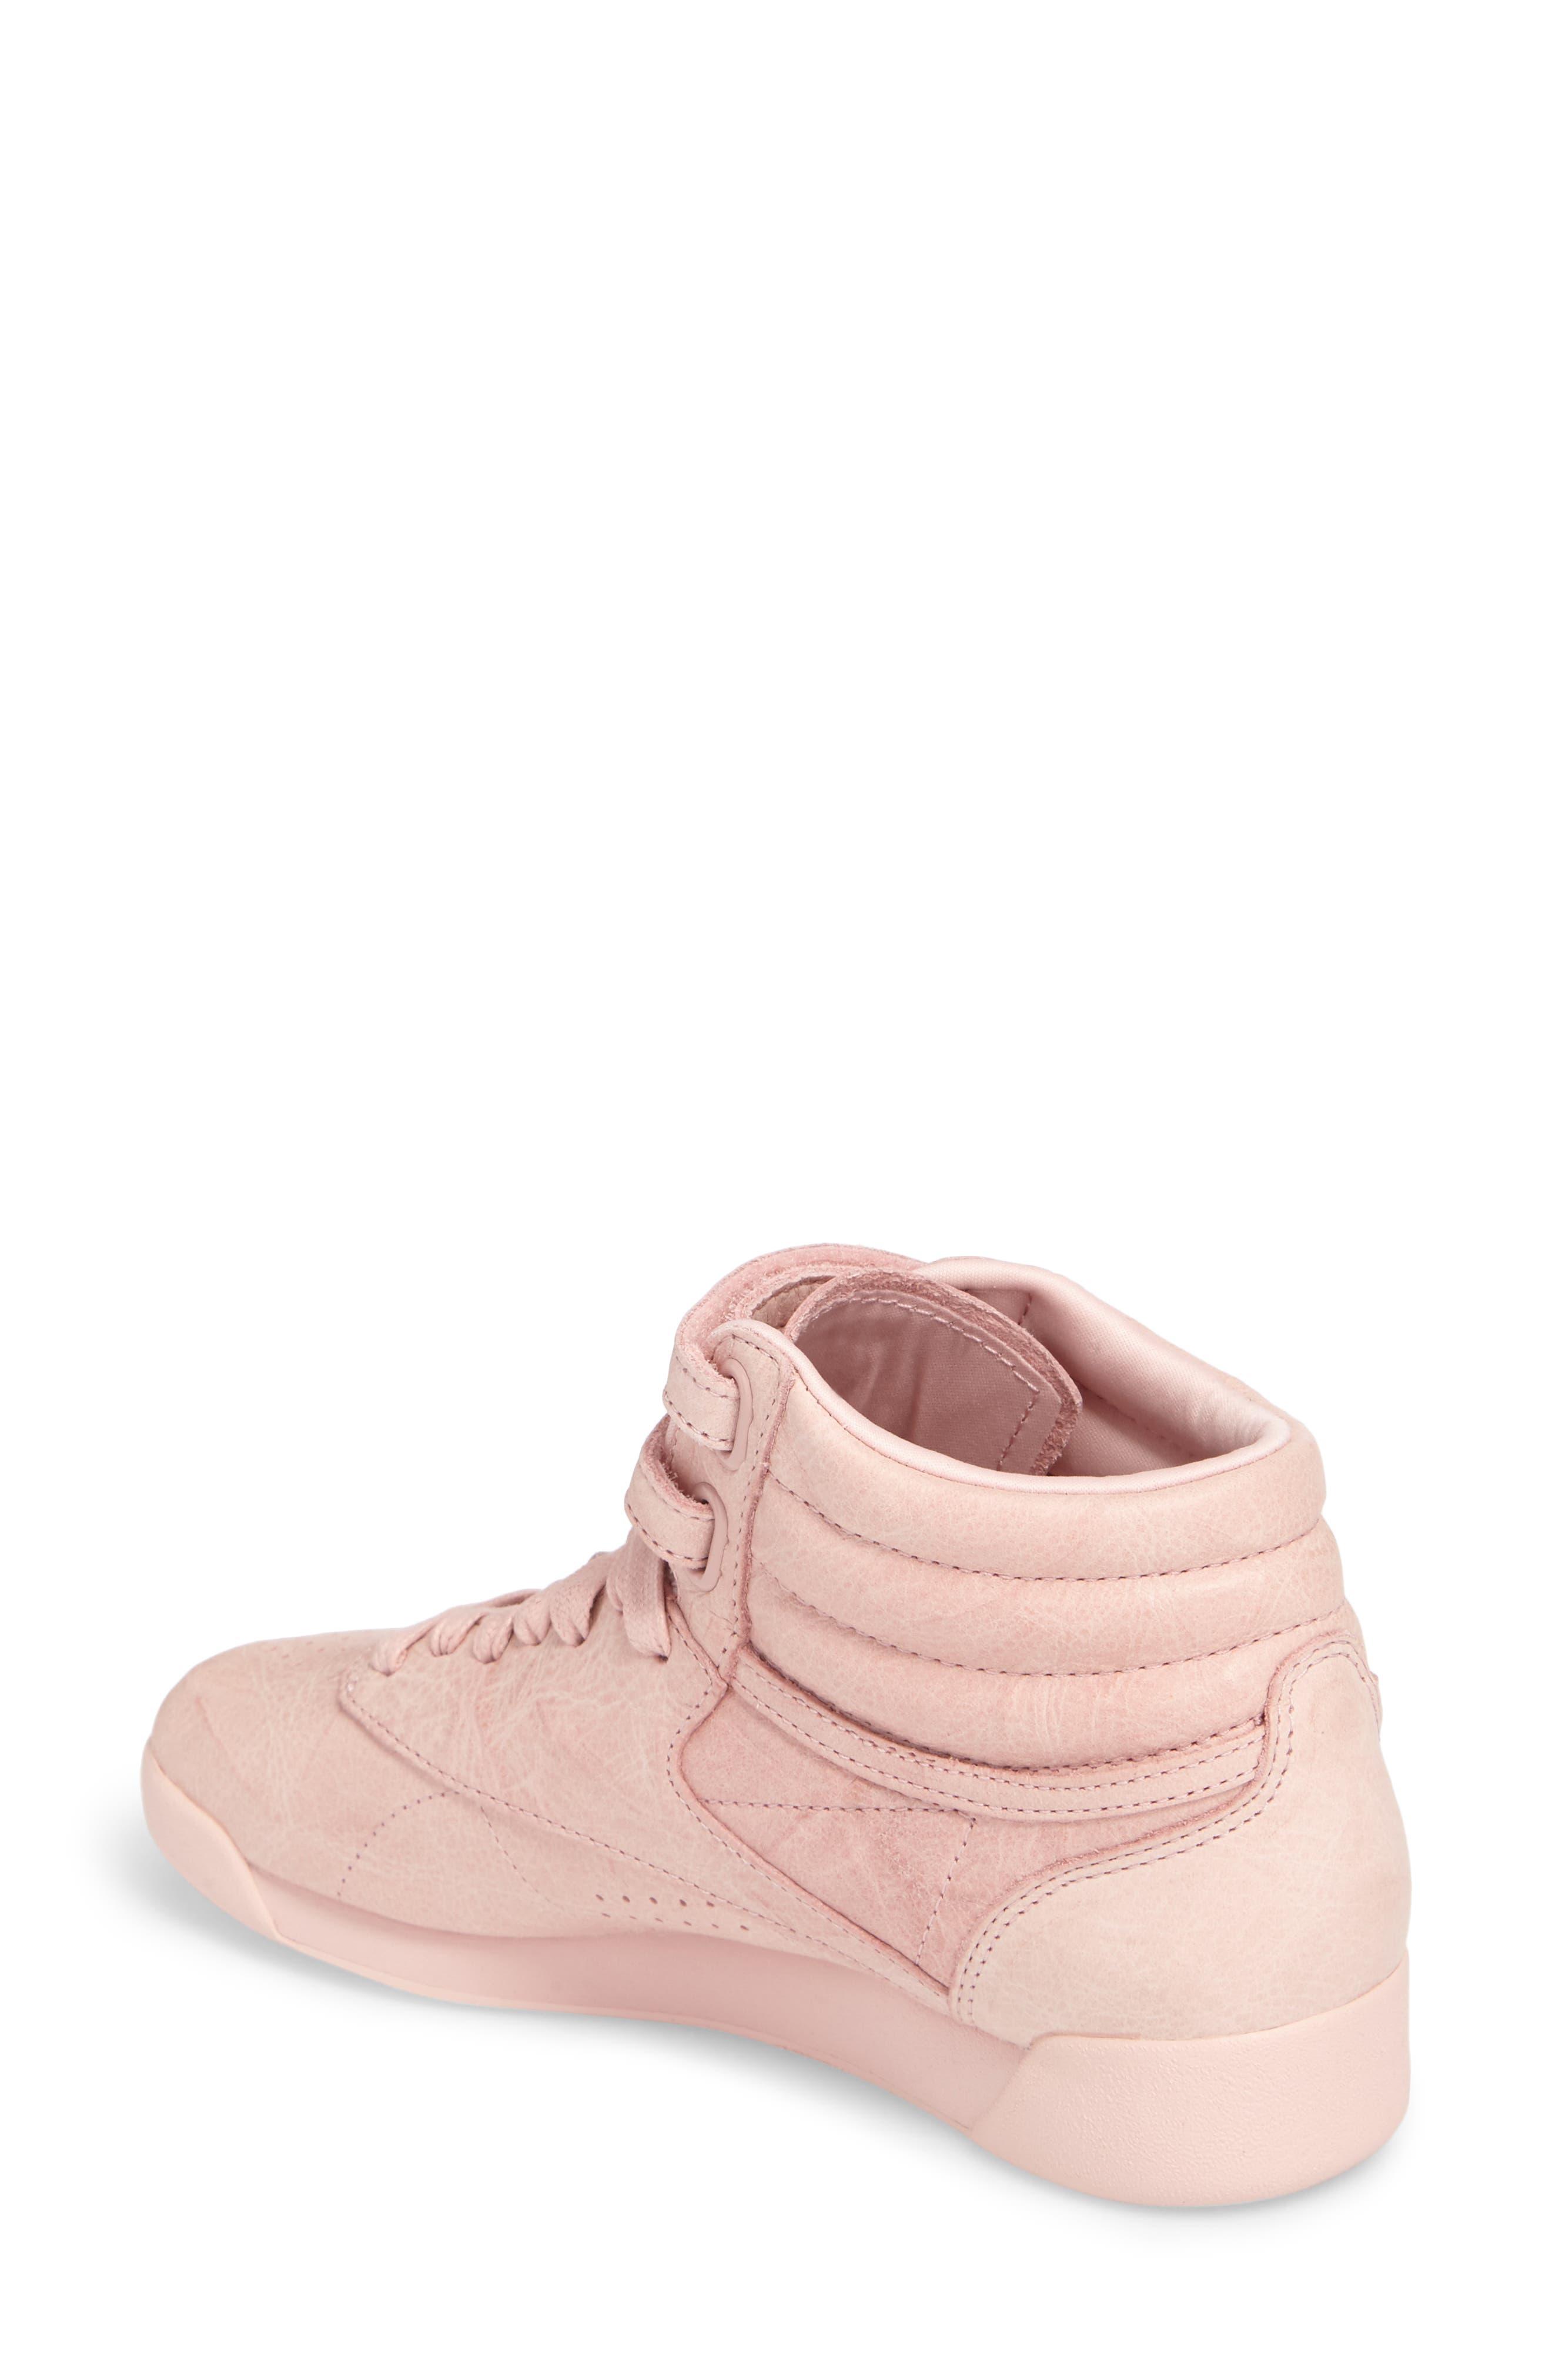 Freestyle Hi Sneaker,                             Alternate thumbnail 6, color,